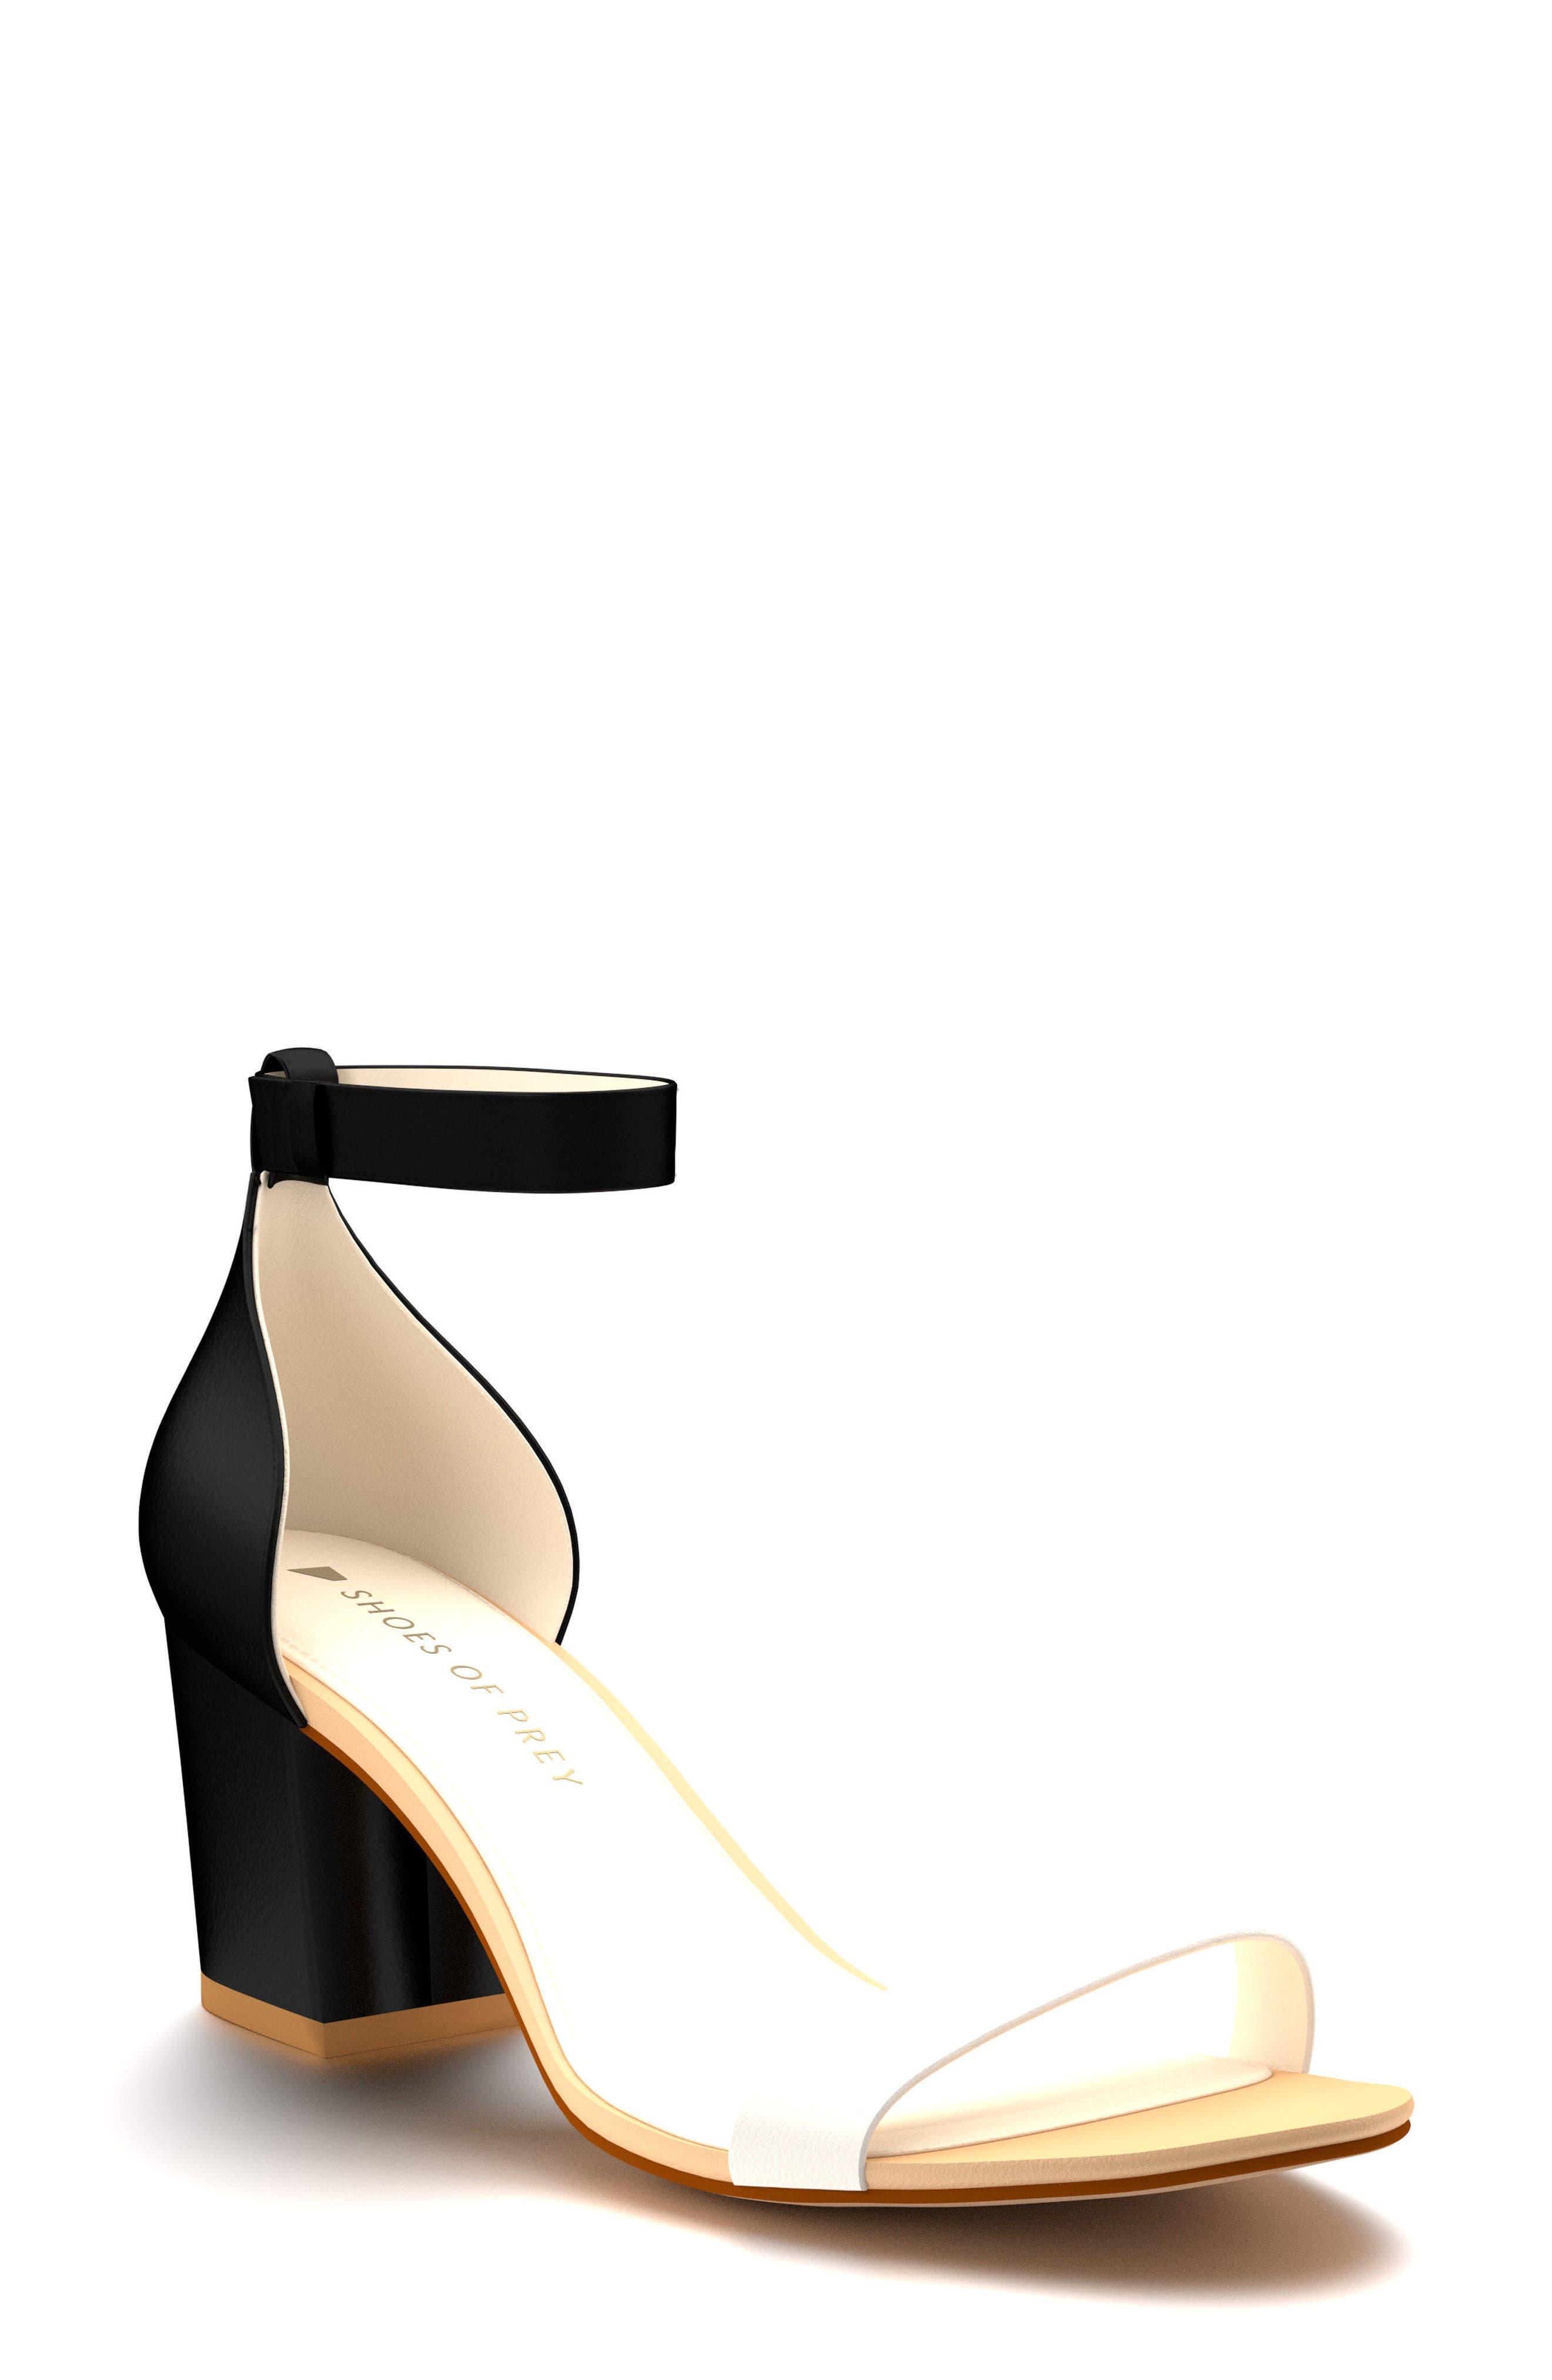 Shoes of Prey Ankle Strap Block Heel Sandal (Women)